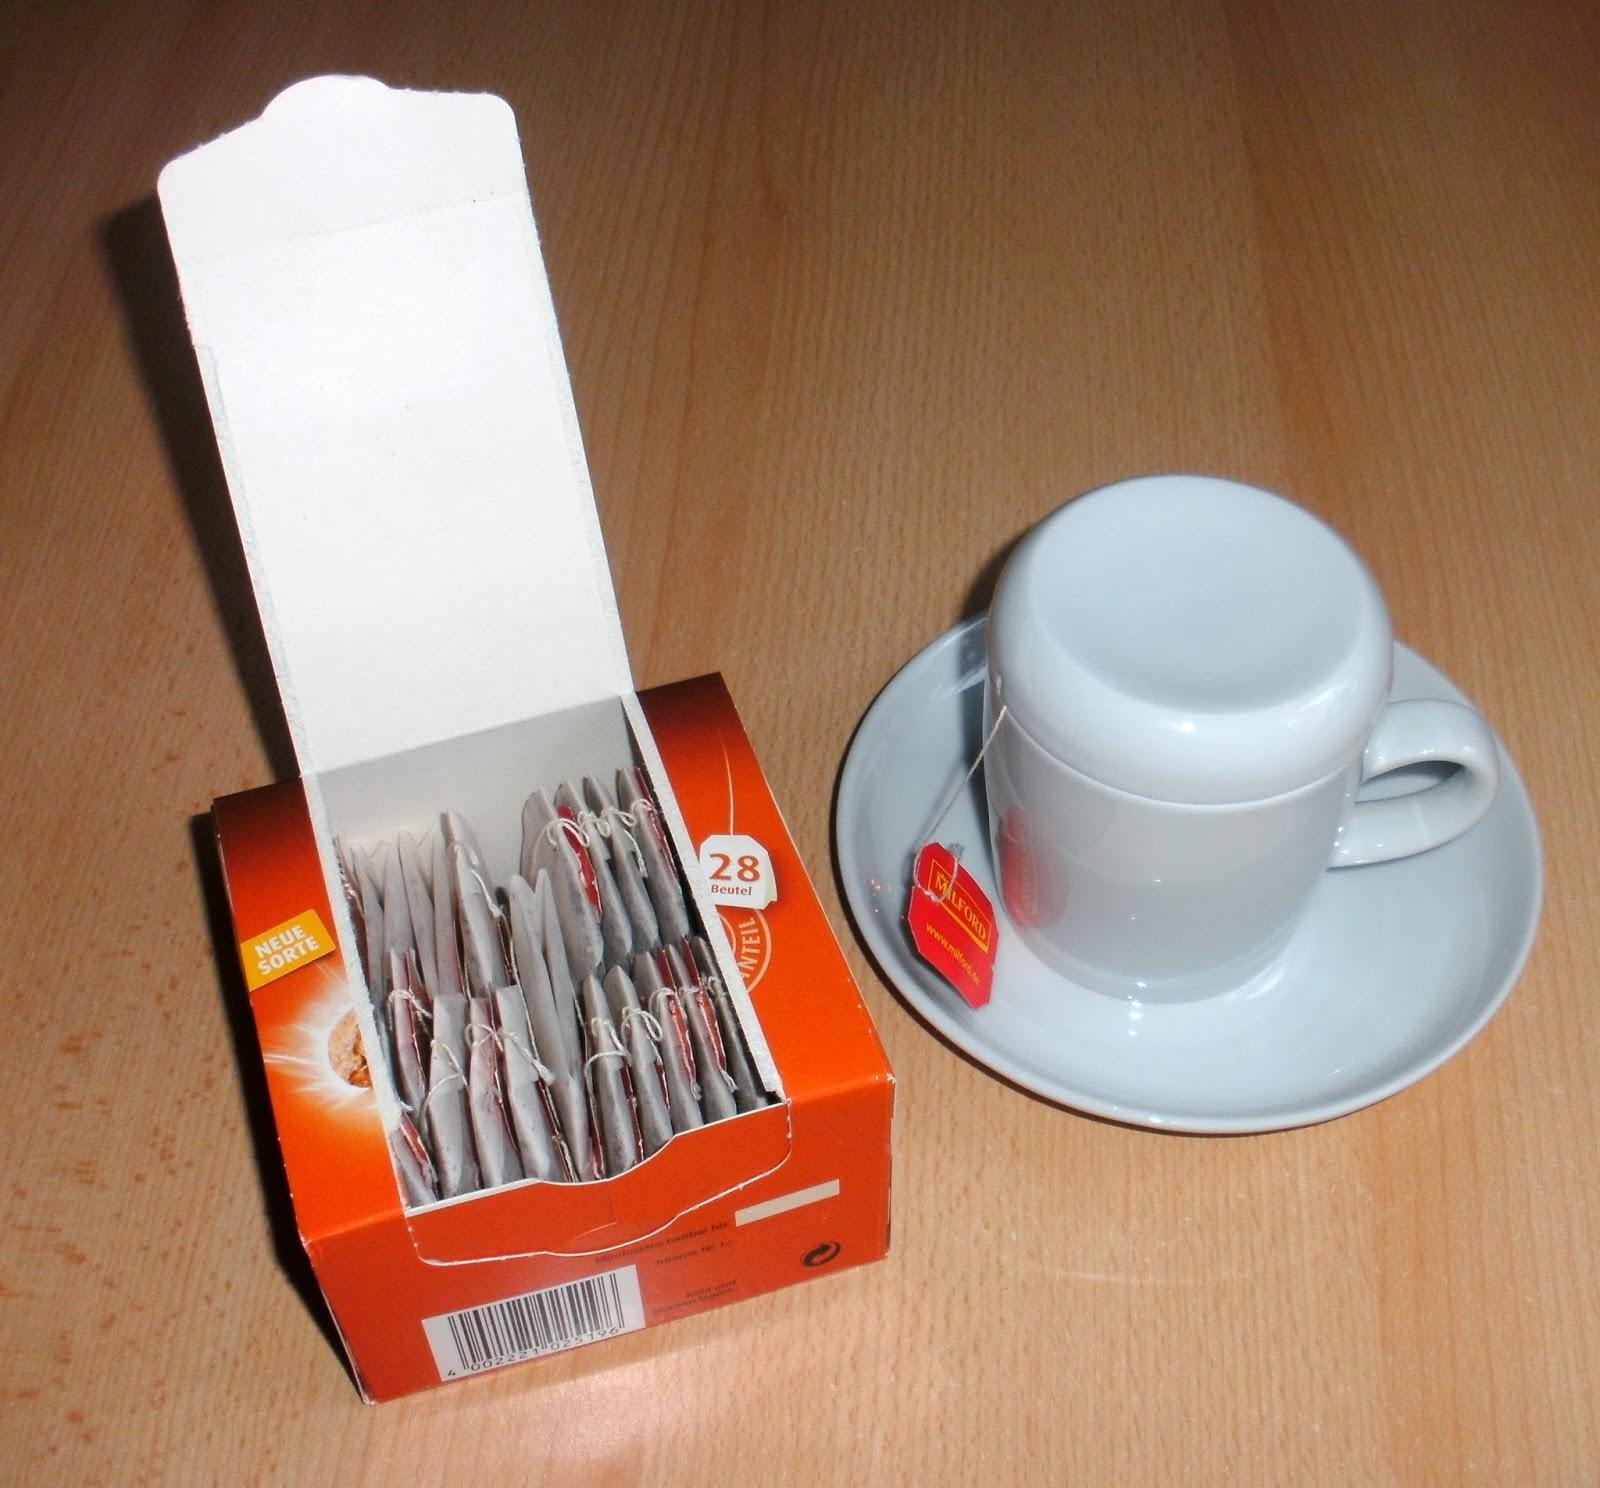 der tee mit dem cola kick von milford tee statt kaffee warentests praxisnah. Black Bedroom Furniture Sets. Home Design Ideas